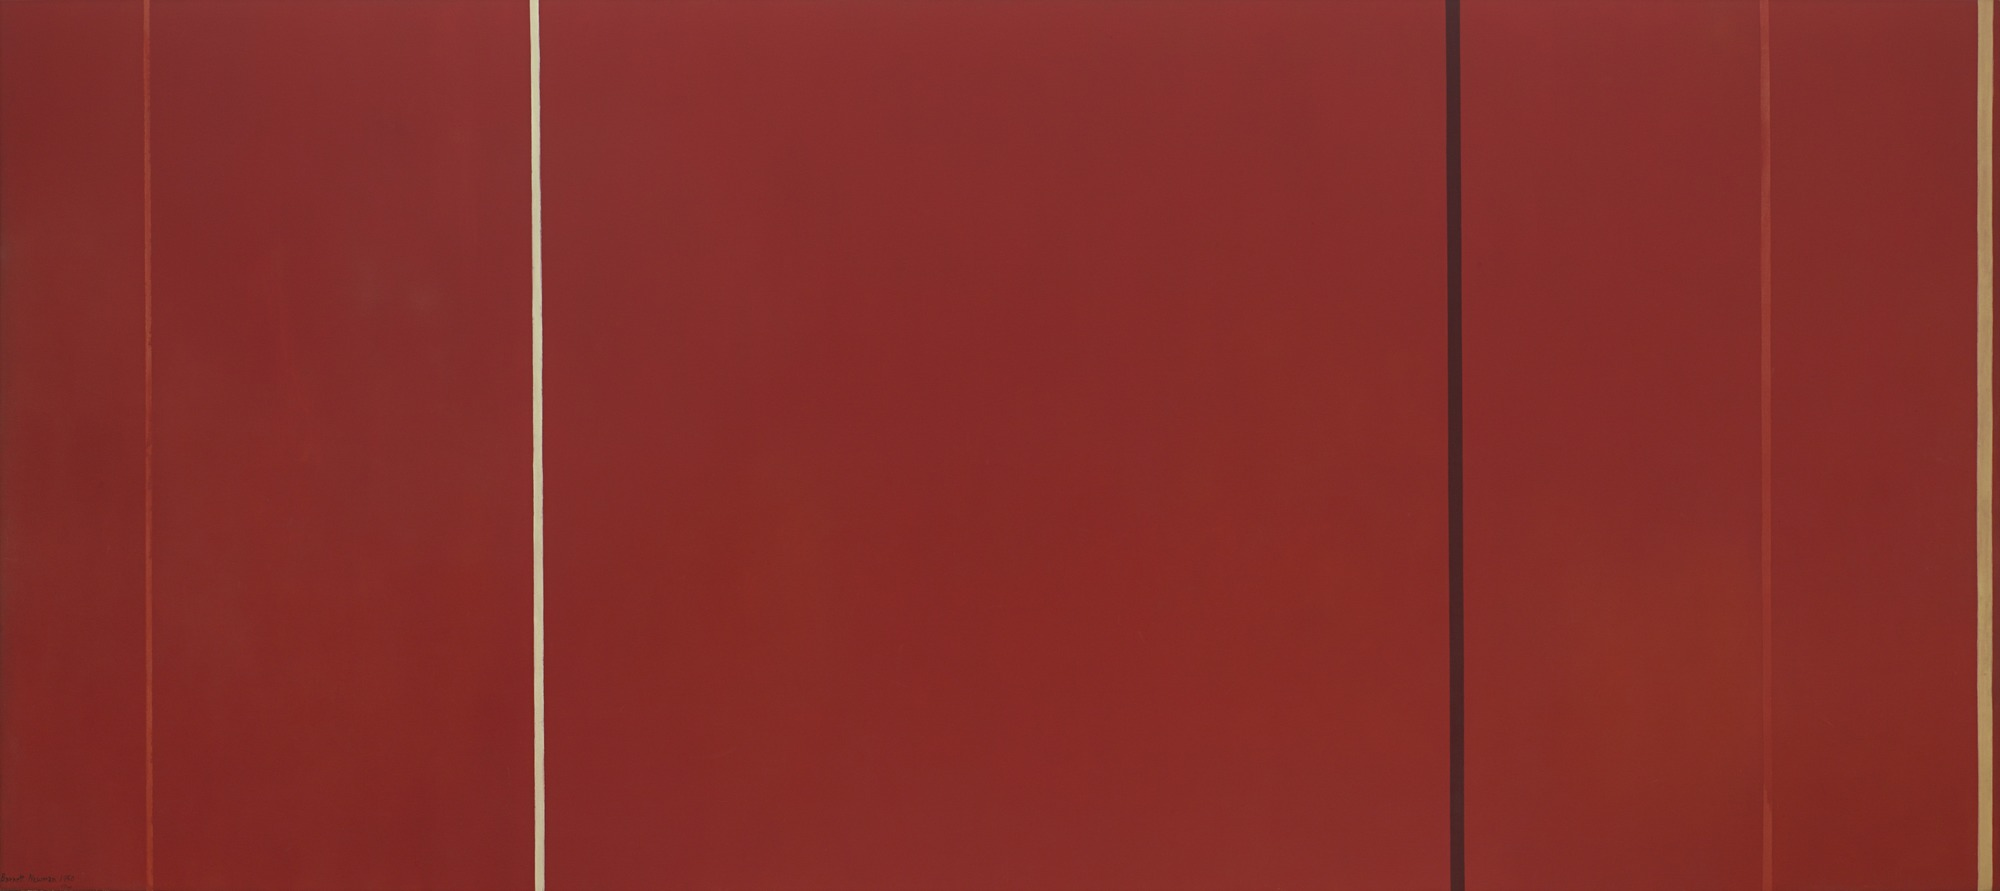 "Barnett Newman   Vir Heroicus Sublimis   1950-51  7' 11 3/8"" x 17' 9 1/4""  Museum of Modern Art"